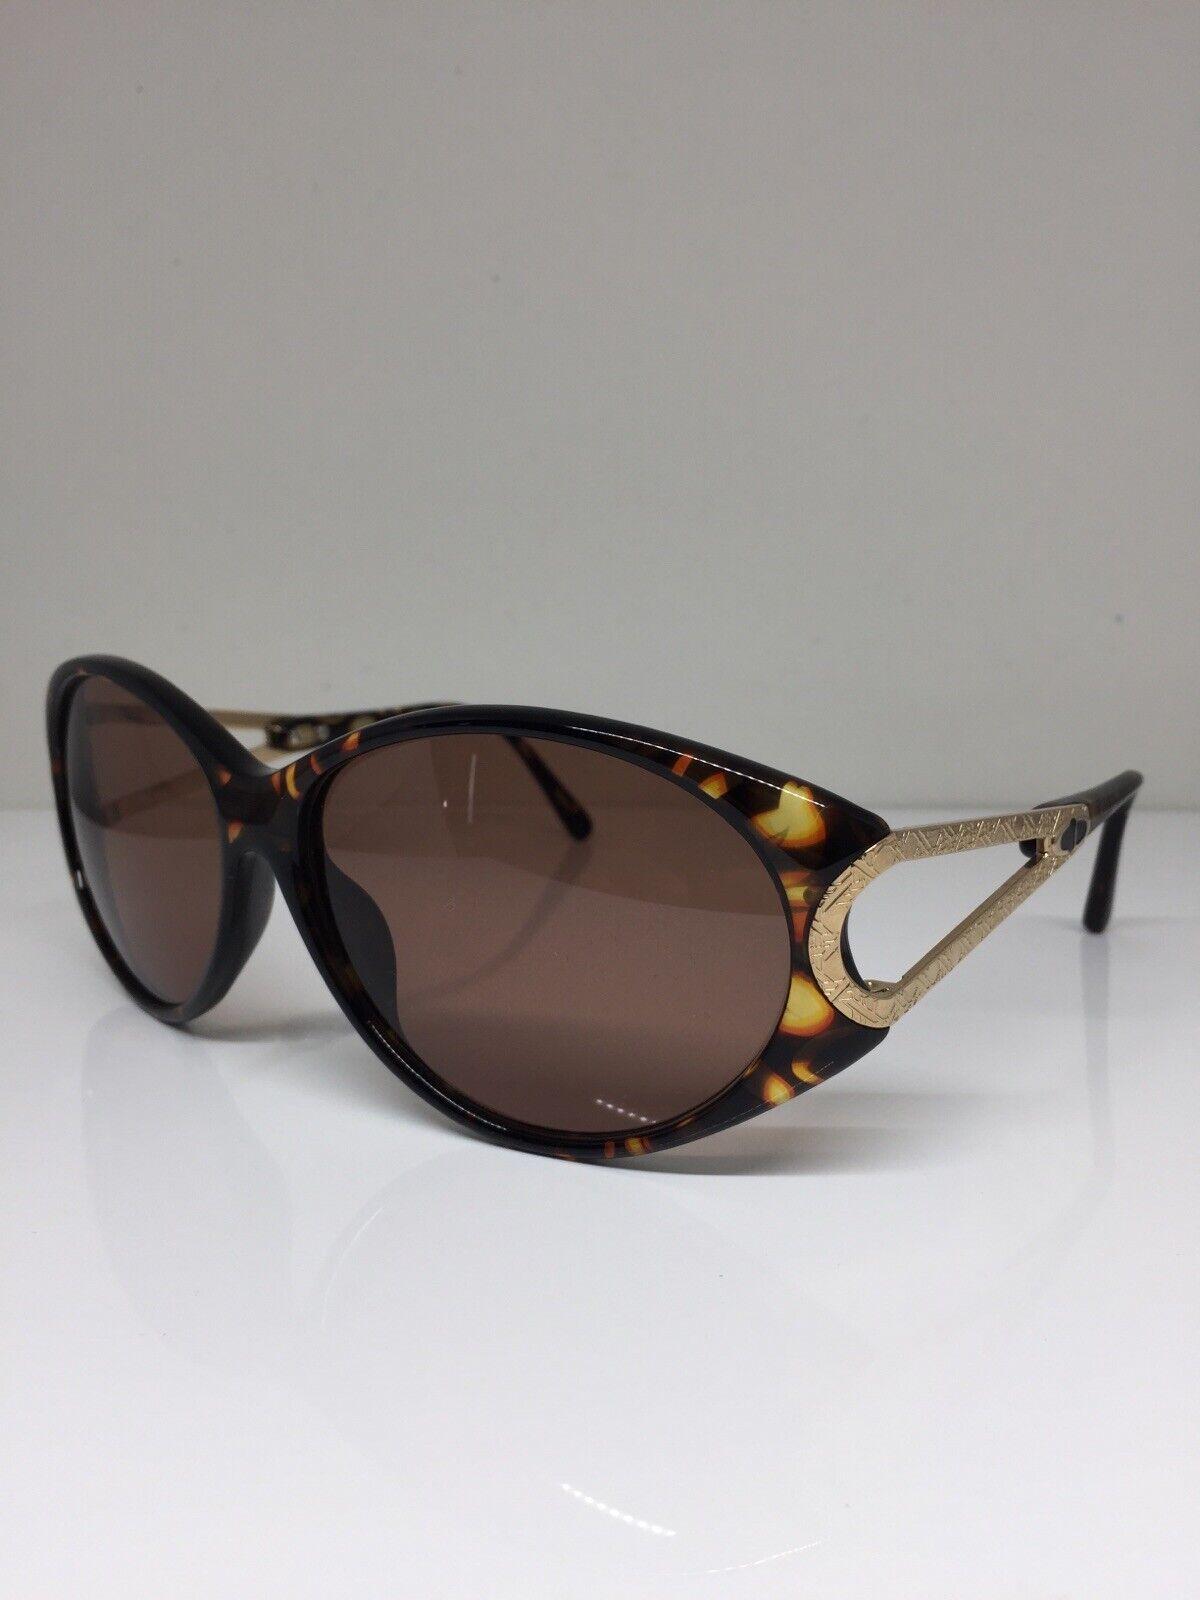 New Vintage Christian Dior CD 2763 Sunglasses C. 10 Tortoise & Gold Austria 60mm